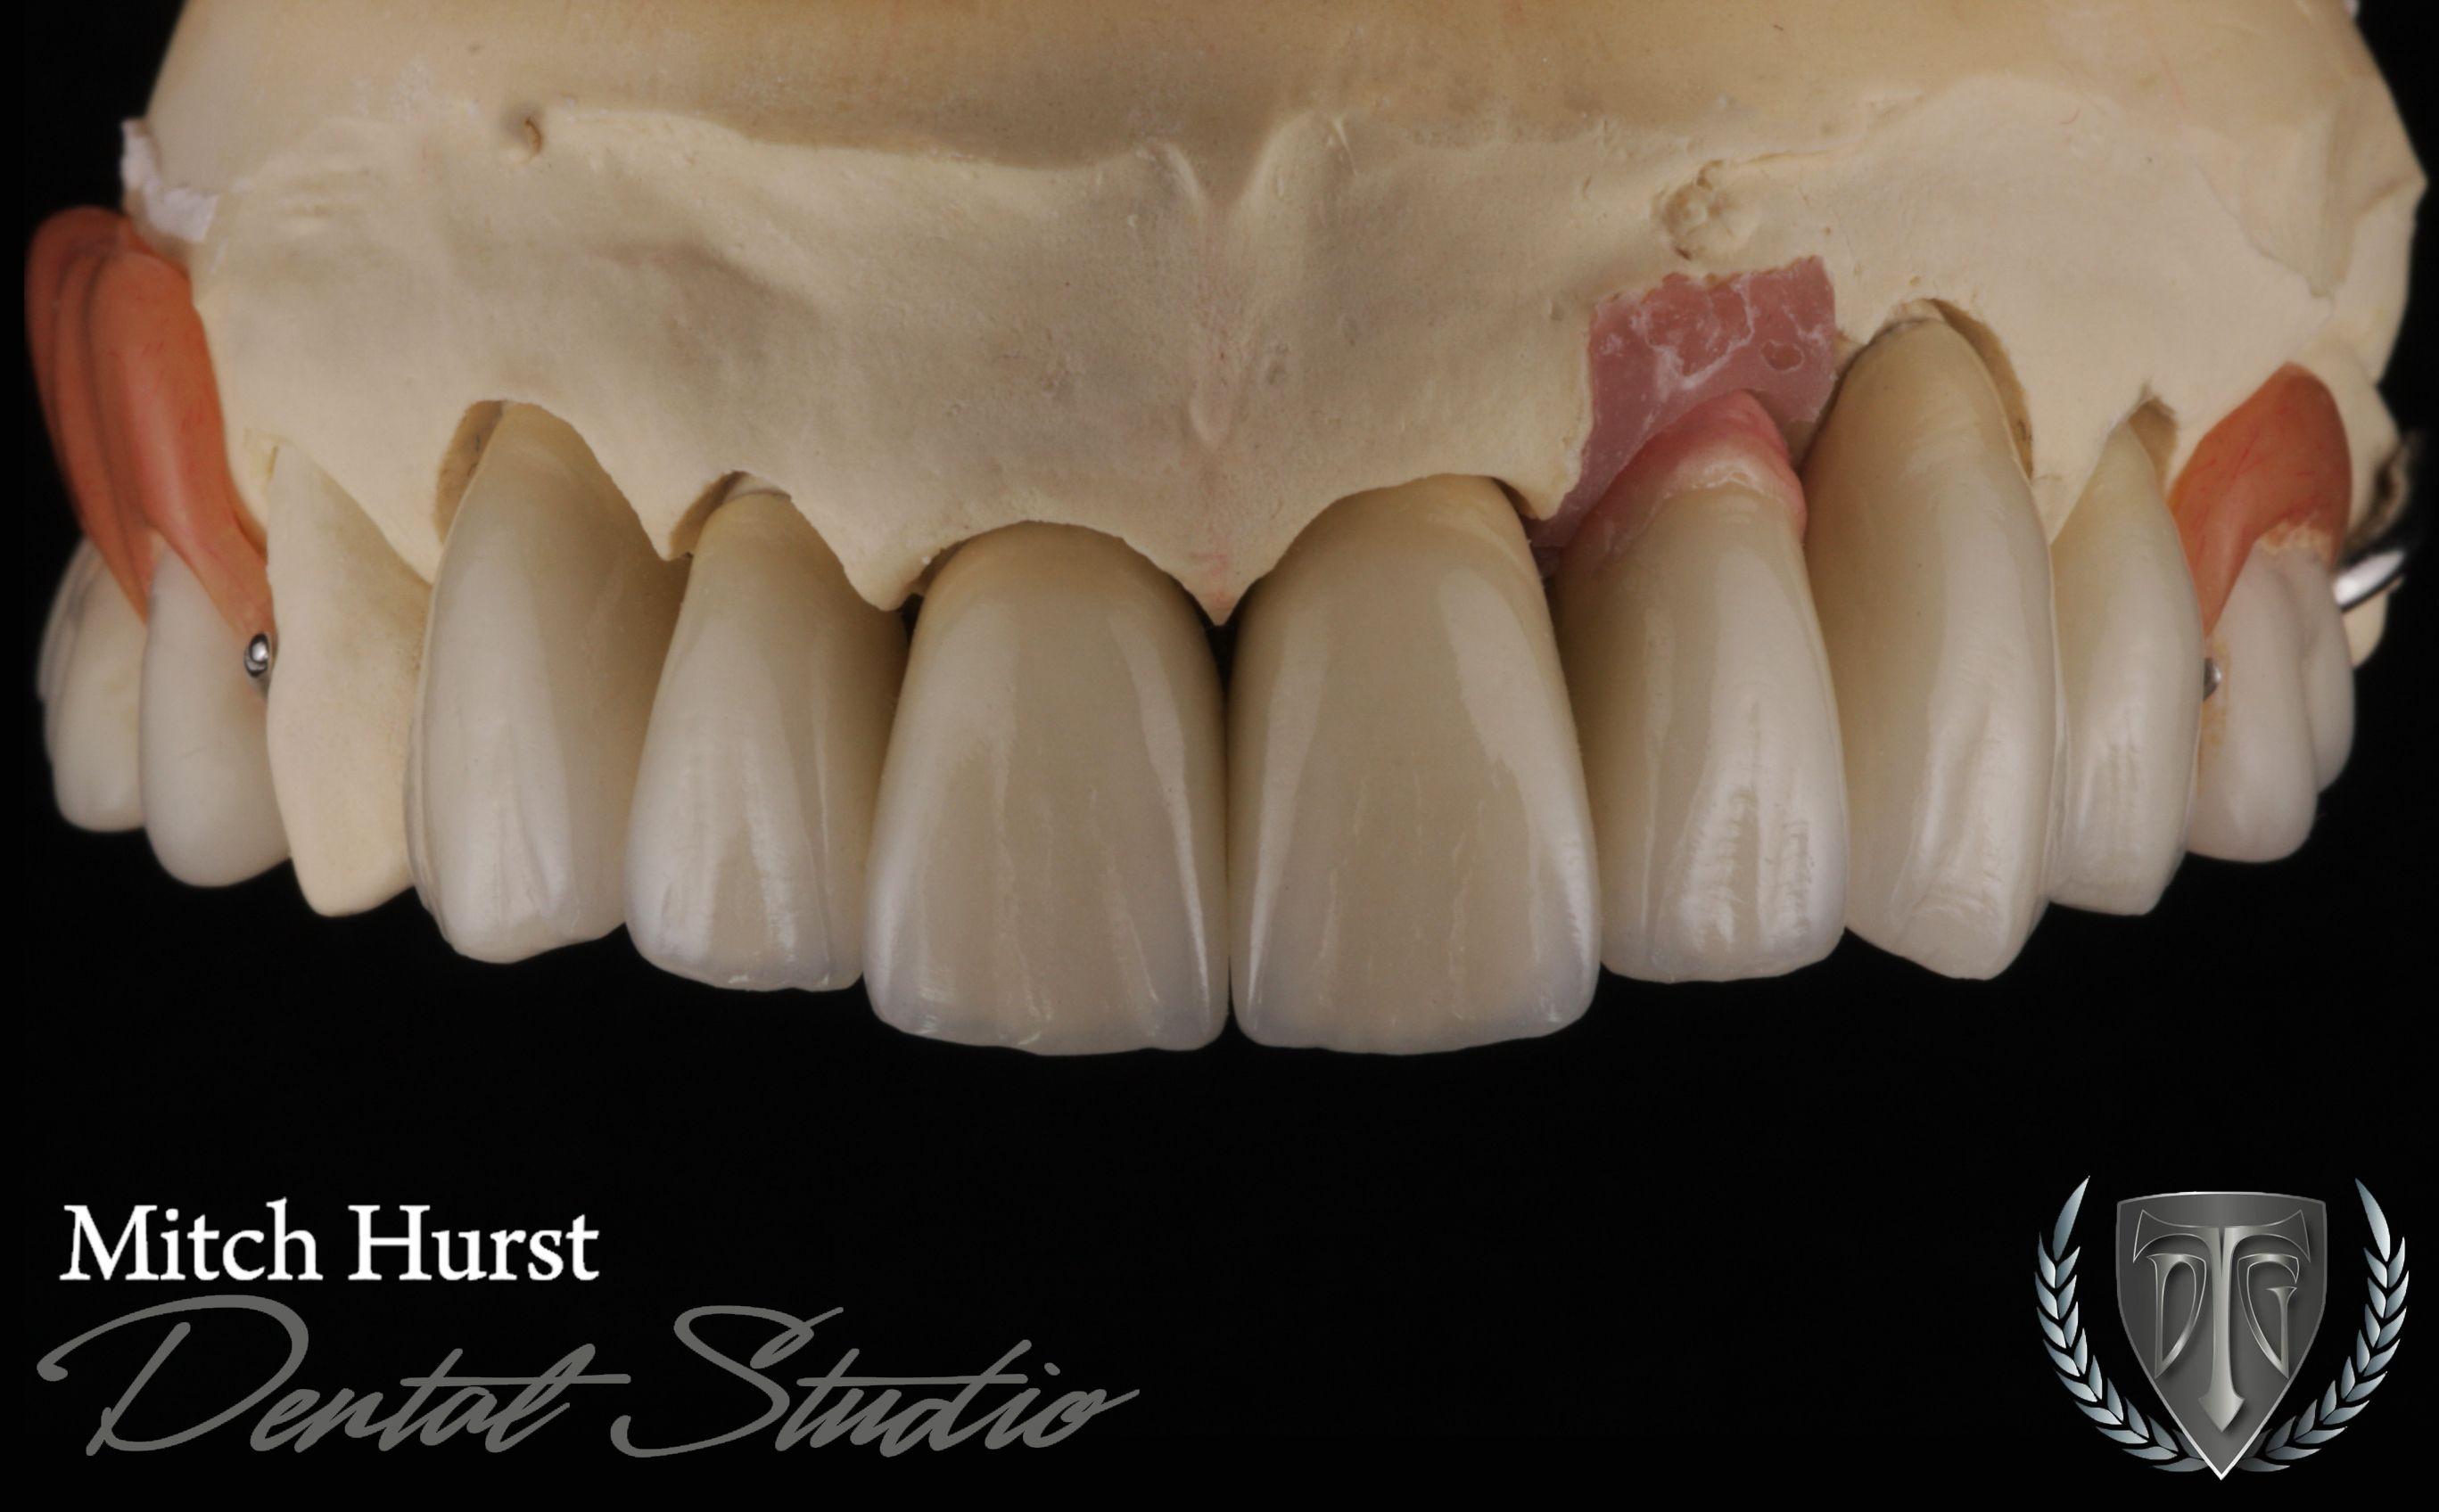 Dental Crowns Cosmetic Dentistry Beautiful Smile Ceramic Restoration Hurstdentalstudio Com Estetica Dental Dental Anatomia Dental